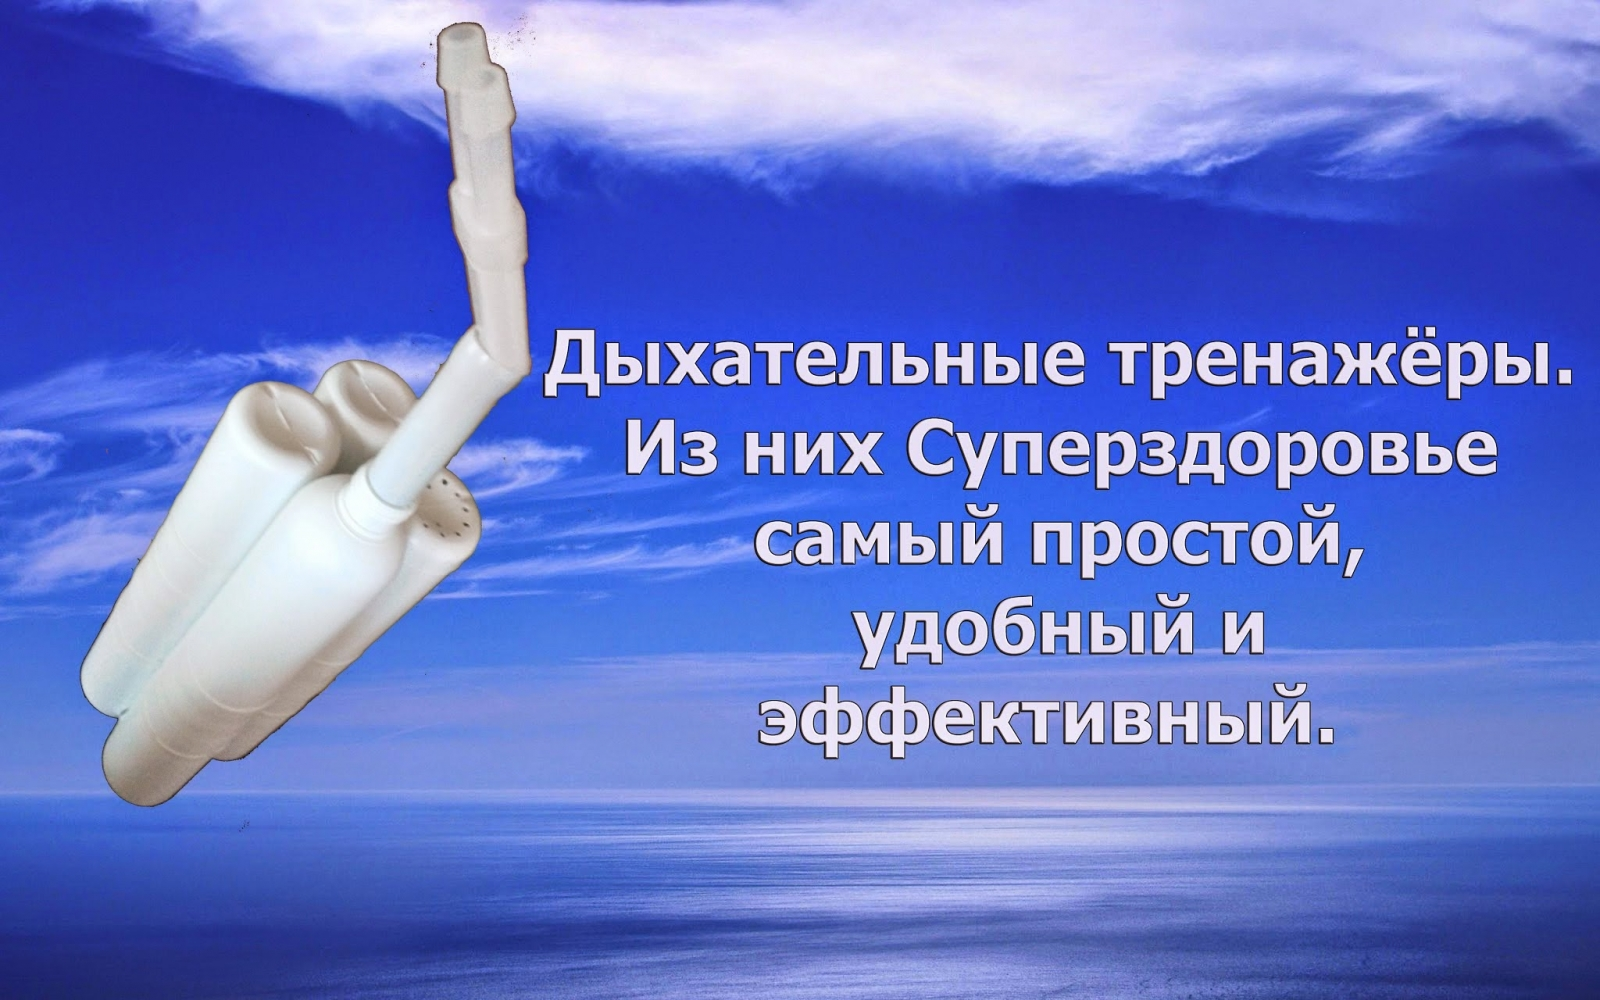 http://celebniymir.ru/images/upload/341ec5636.jpg